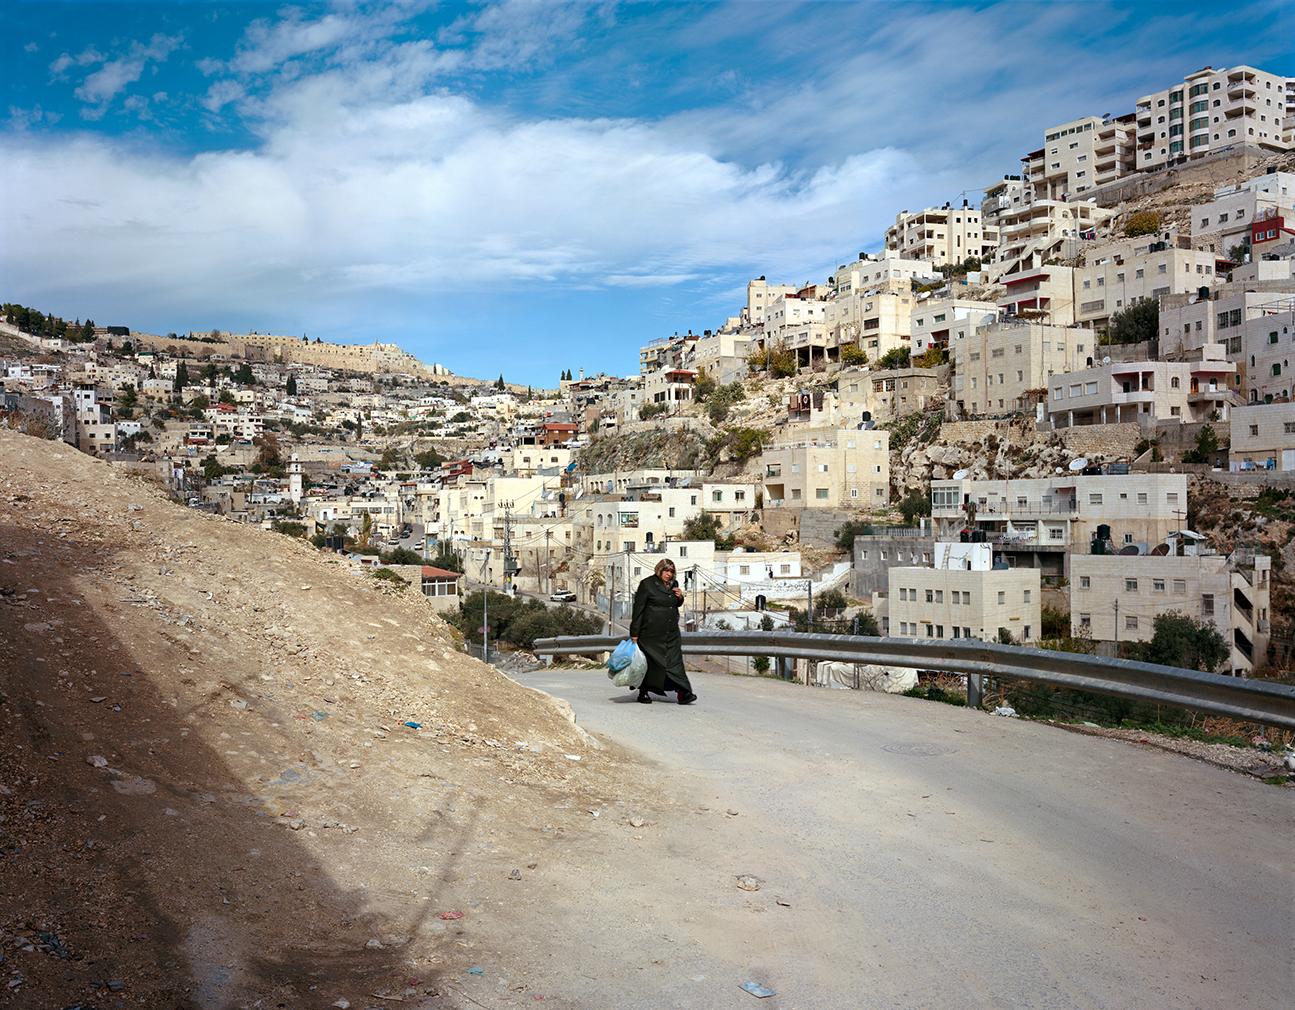 Silwan, East Jerusalem, by Thomas Struth